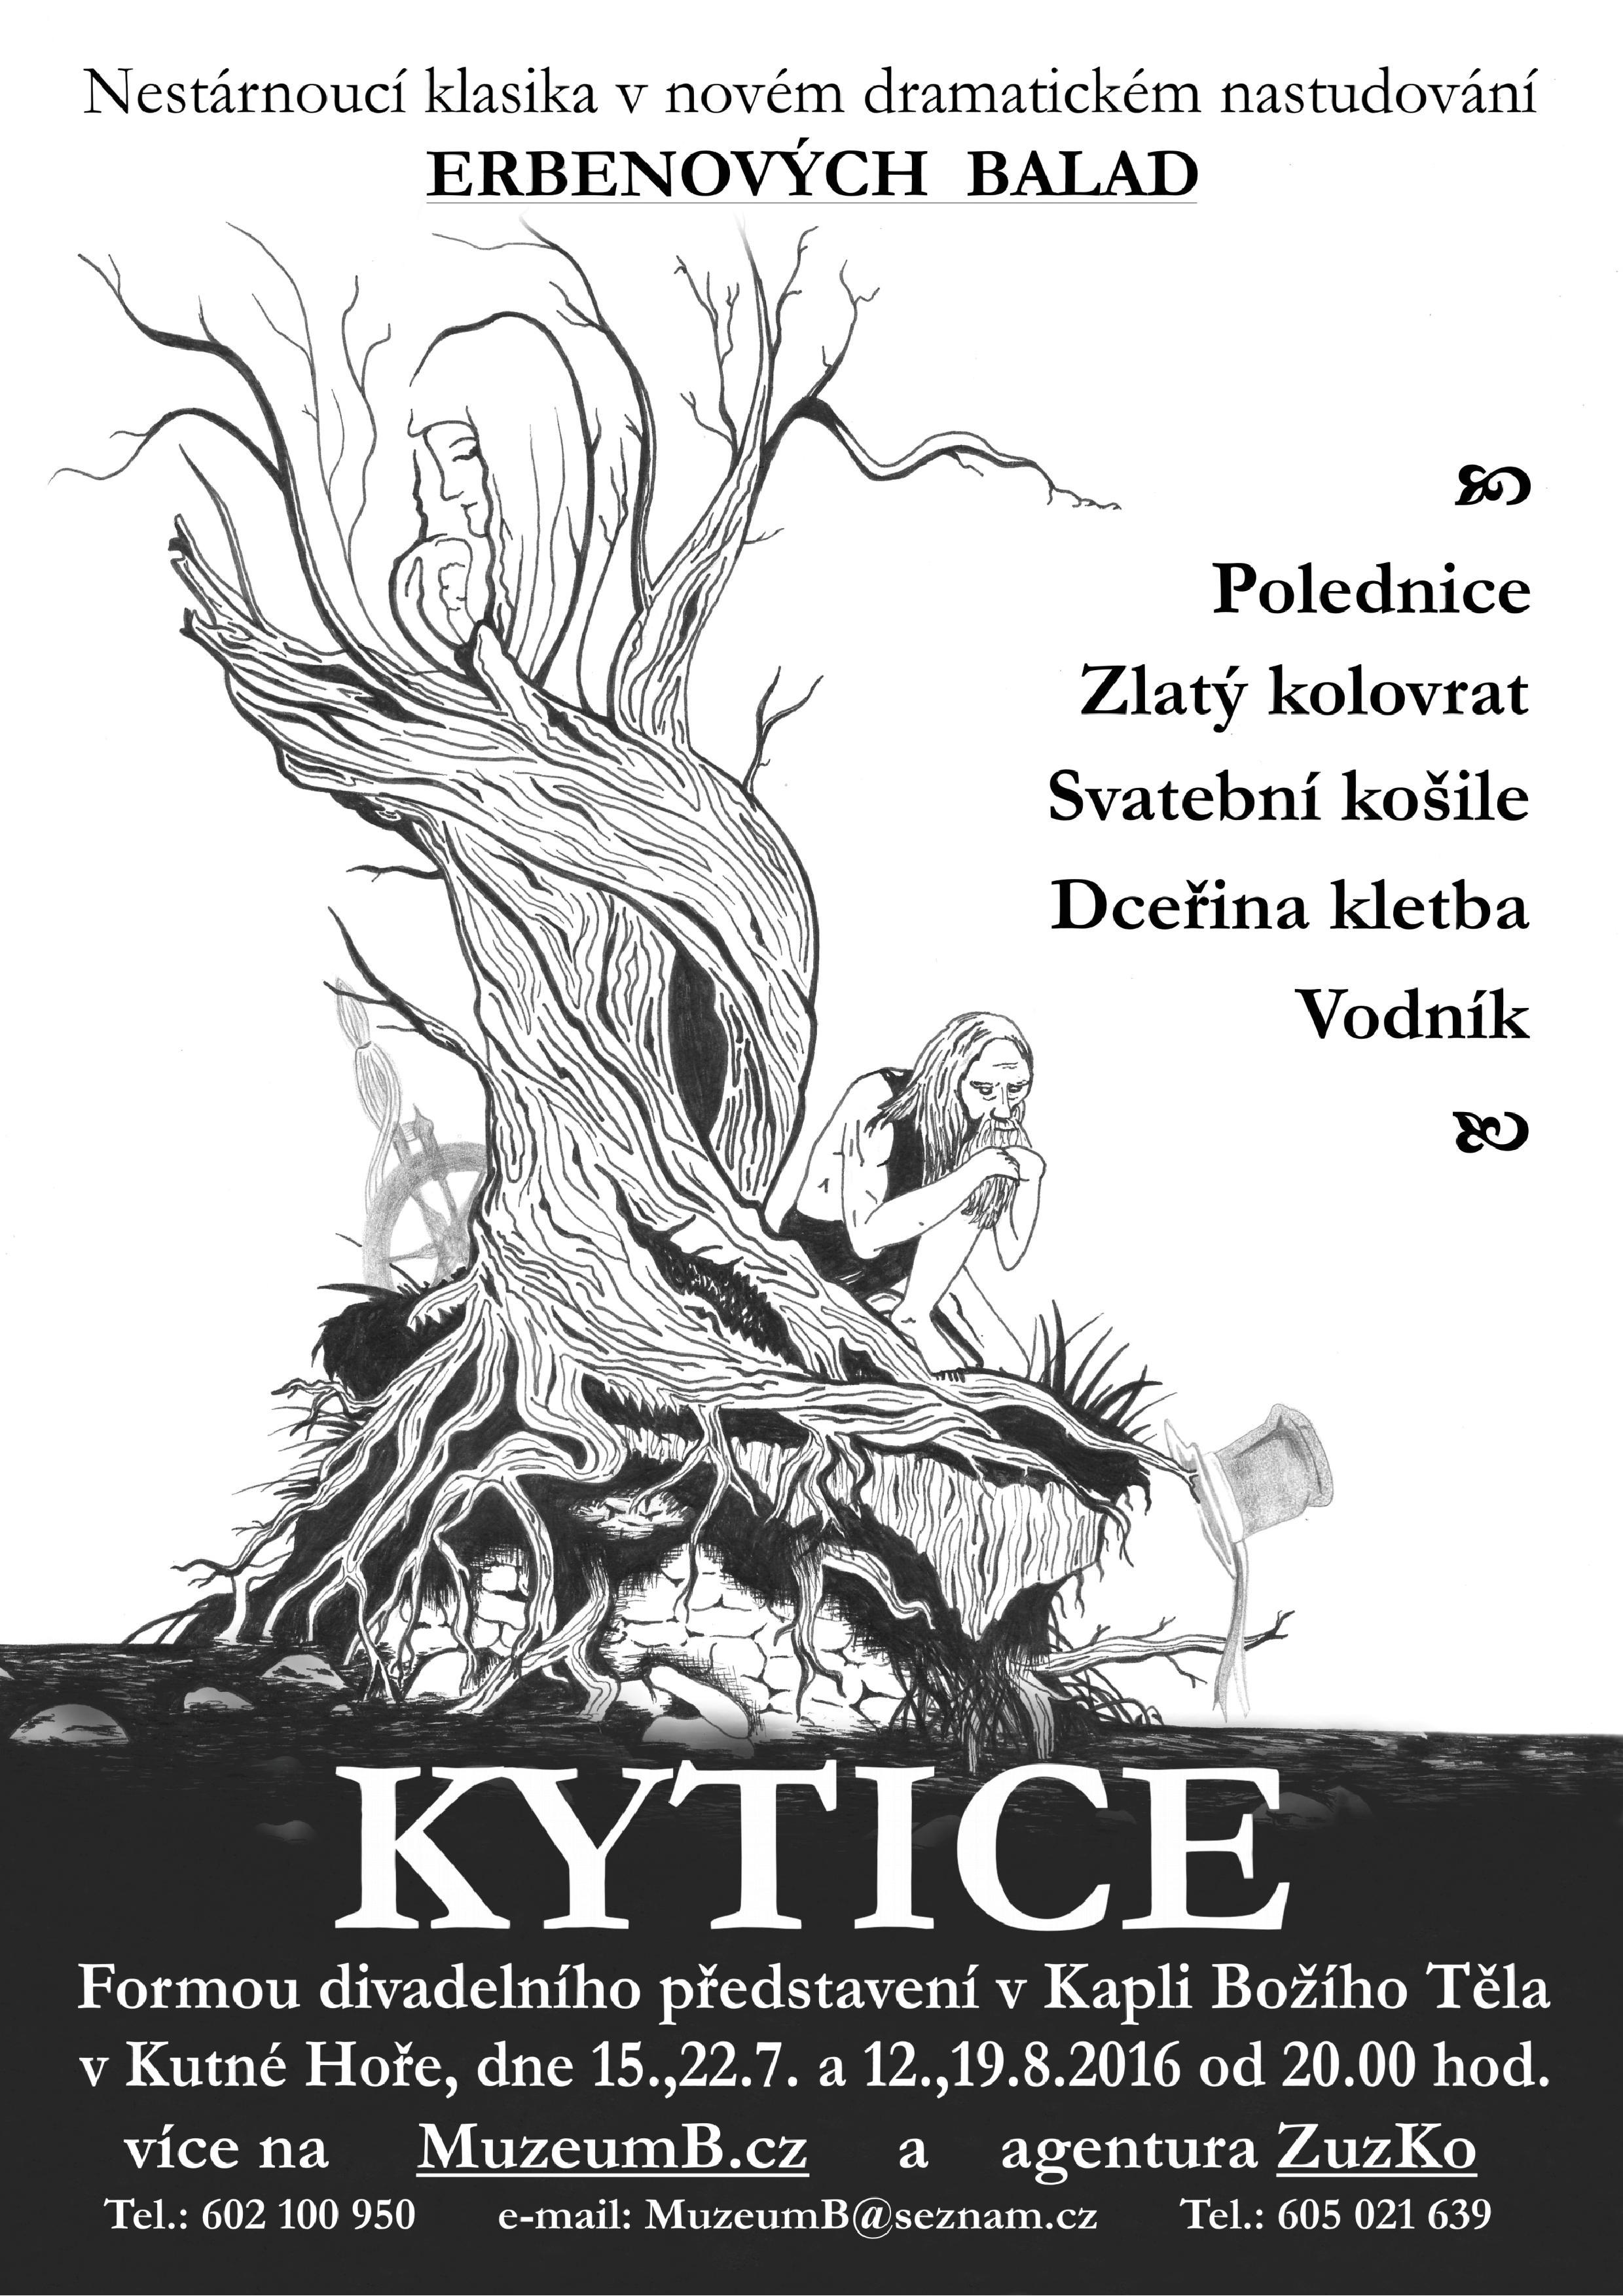 684-kytice-plakat-pdf.jpg